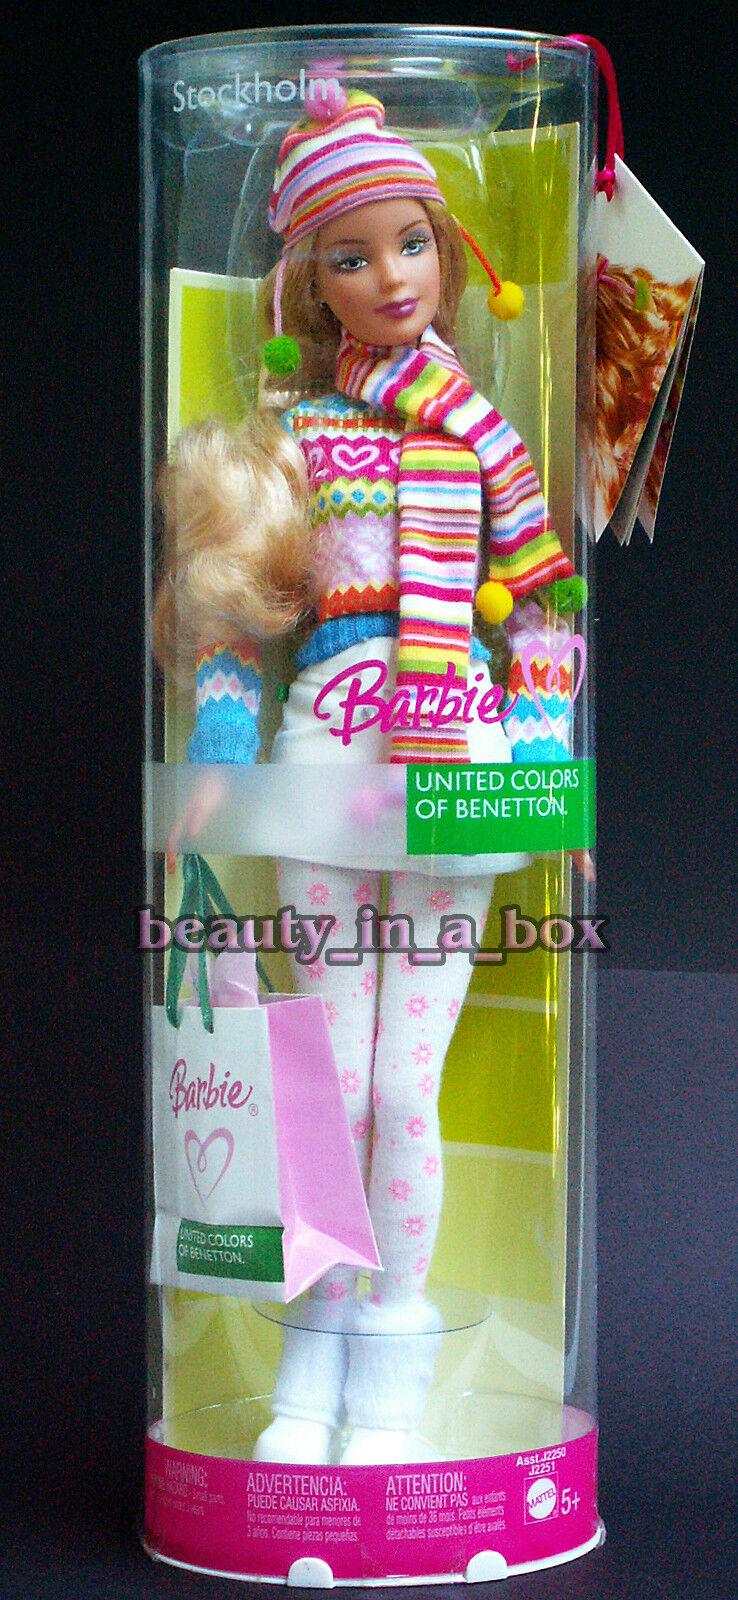 Muñeca Barbie De Estocolmo  United Colors of Benetton Moda Italia Italiana  raros